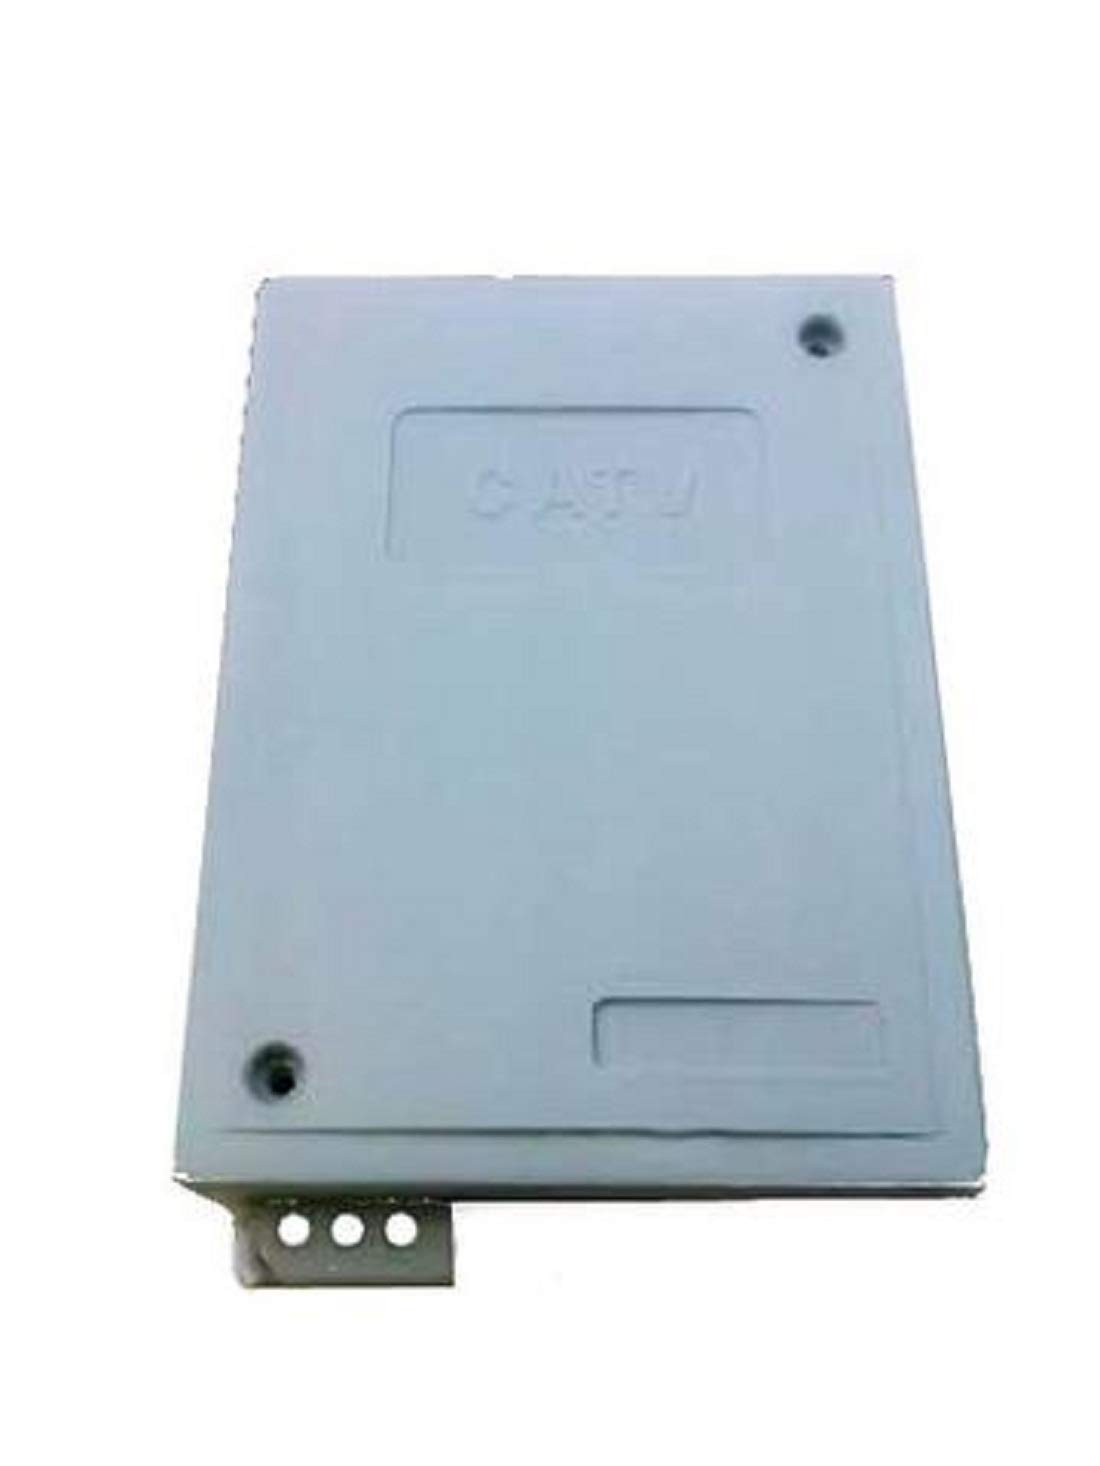 7'x5'x1.5' OUTDOOR CABLETEK ENCLOSURE PLASTIC GRAY CASE UTILITY CABLE BOX MTE-S CECOMINOD049106